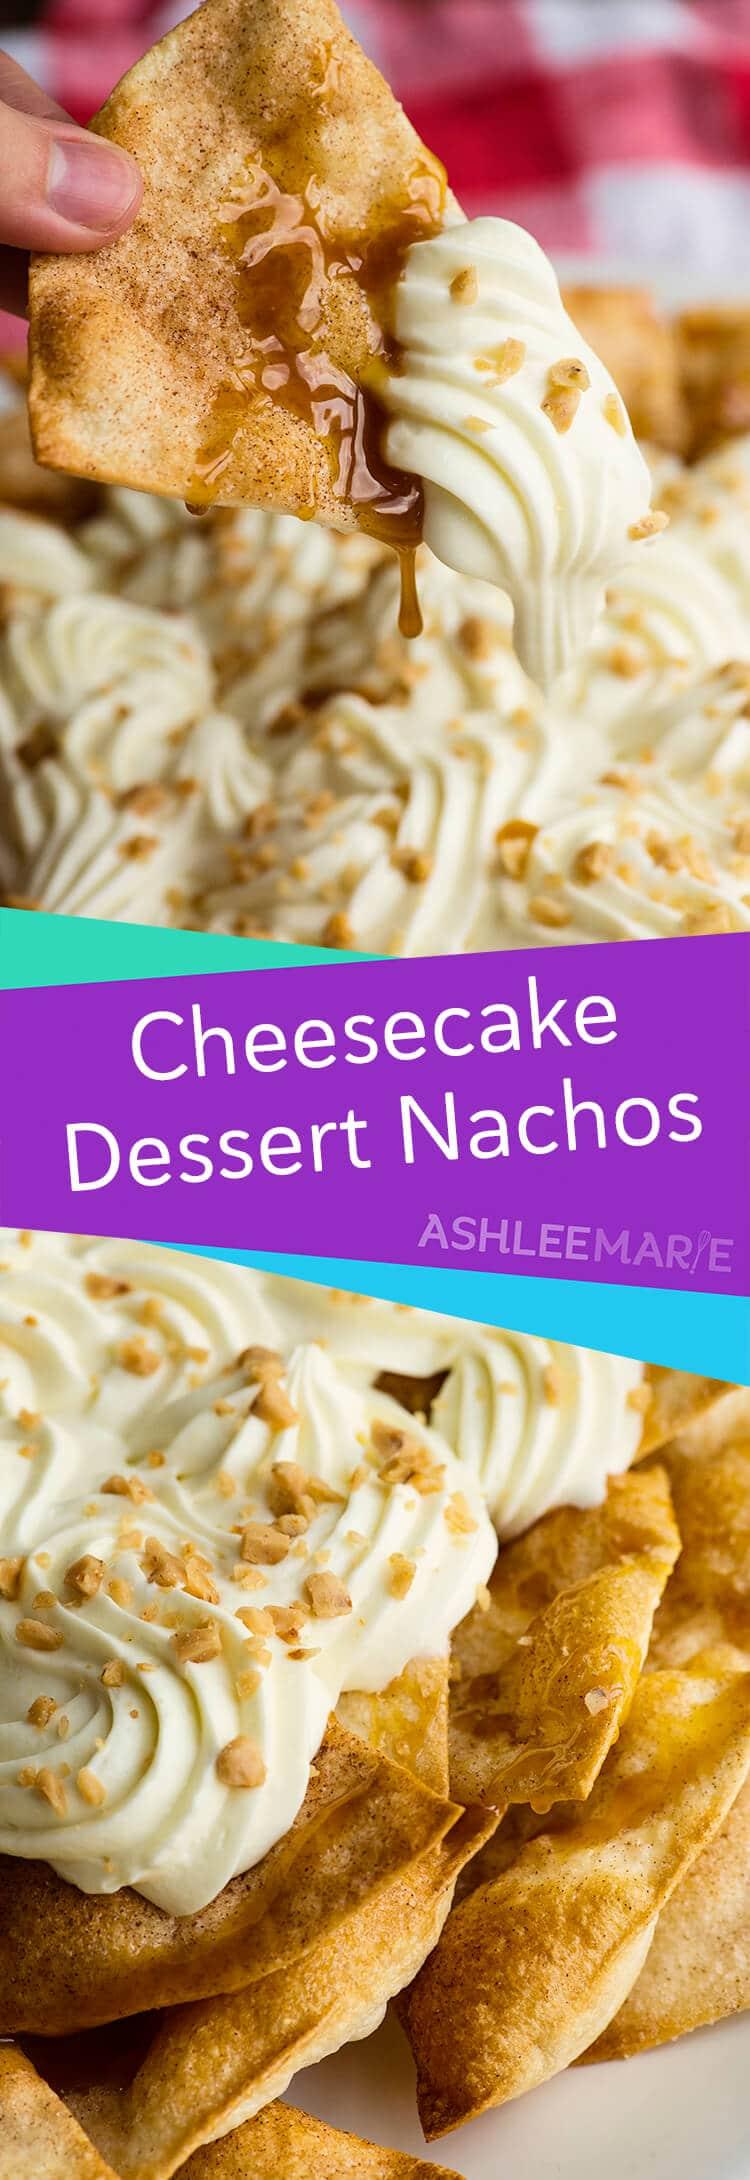 Caramel cheesecake nachos